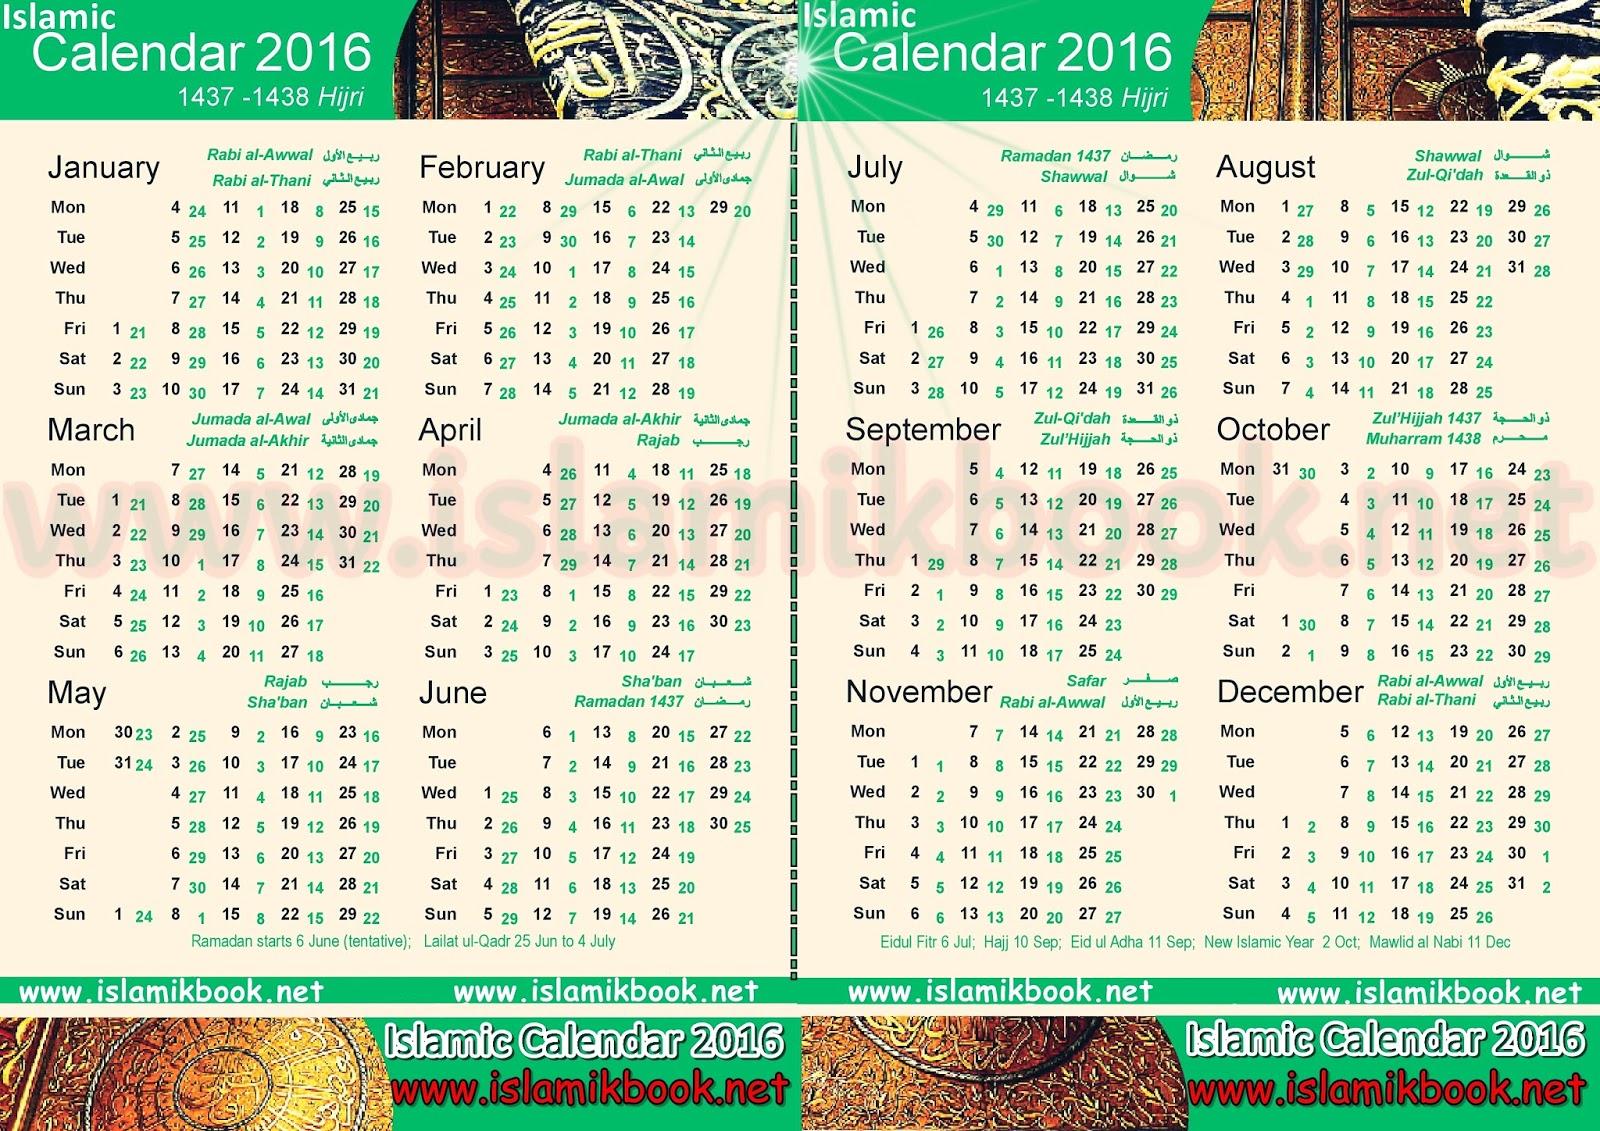 ... Calendar 2016 Related Keywords & Suggestions - Islamic Calendar